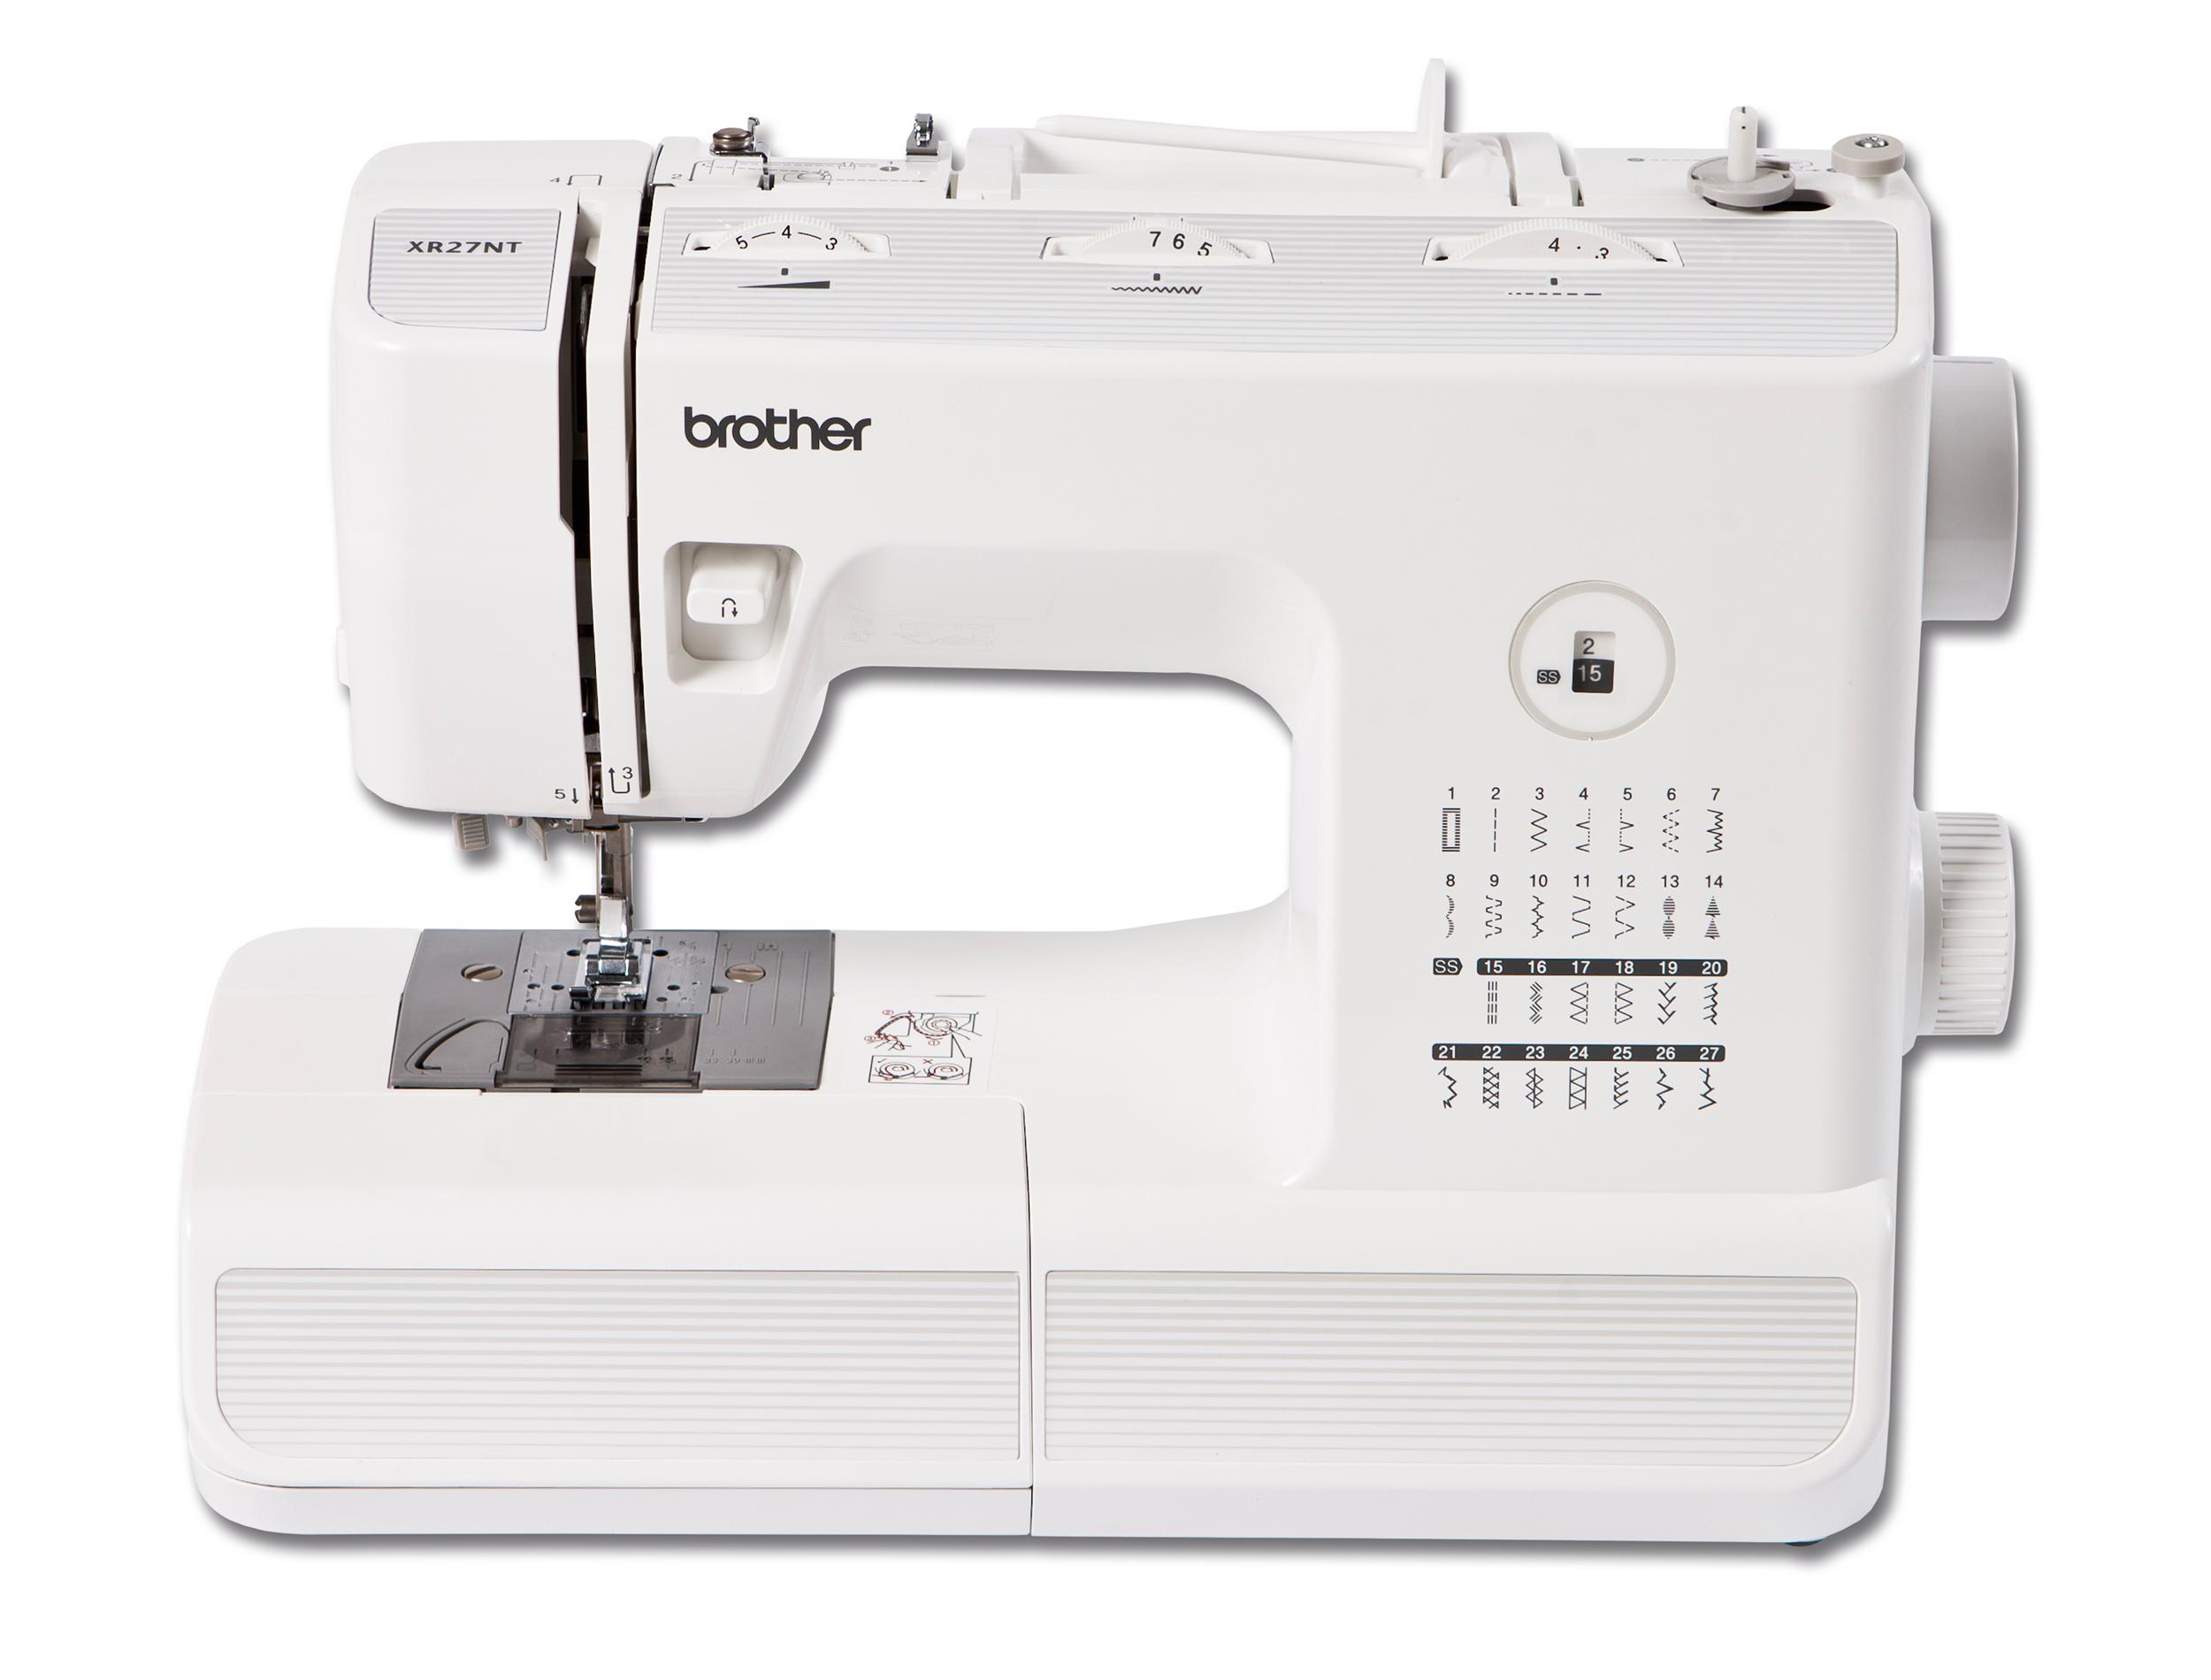 Brother XR27NT Sewing Machine | Hobkirk Sewing Machines Ltd